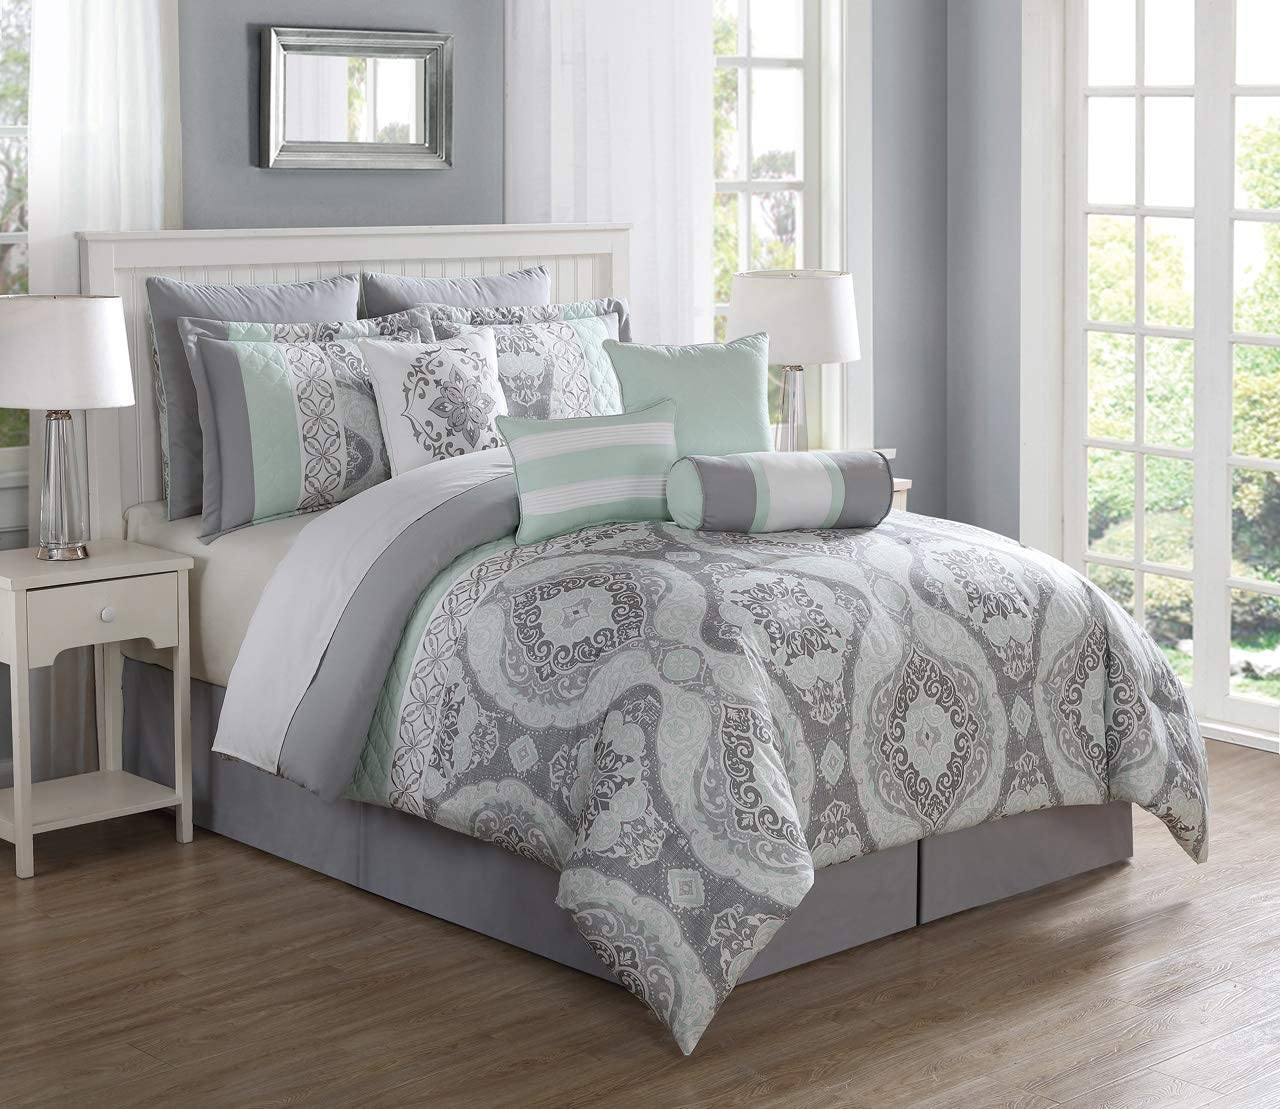 S.L. Home Fashion 10 Piece Bianca Mint/Gray Comforter Set King